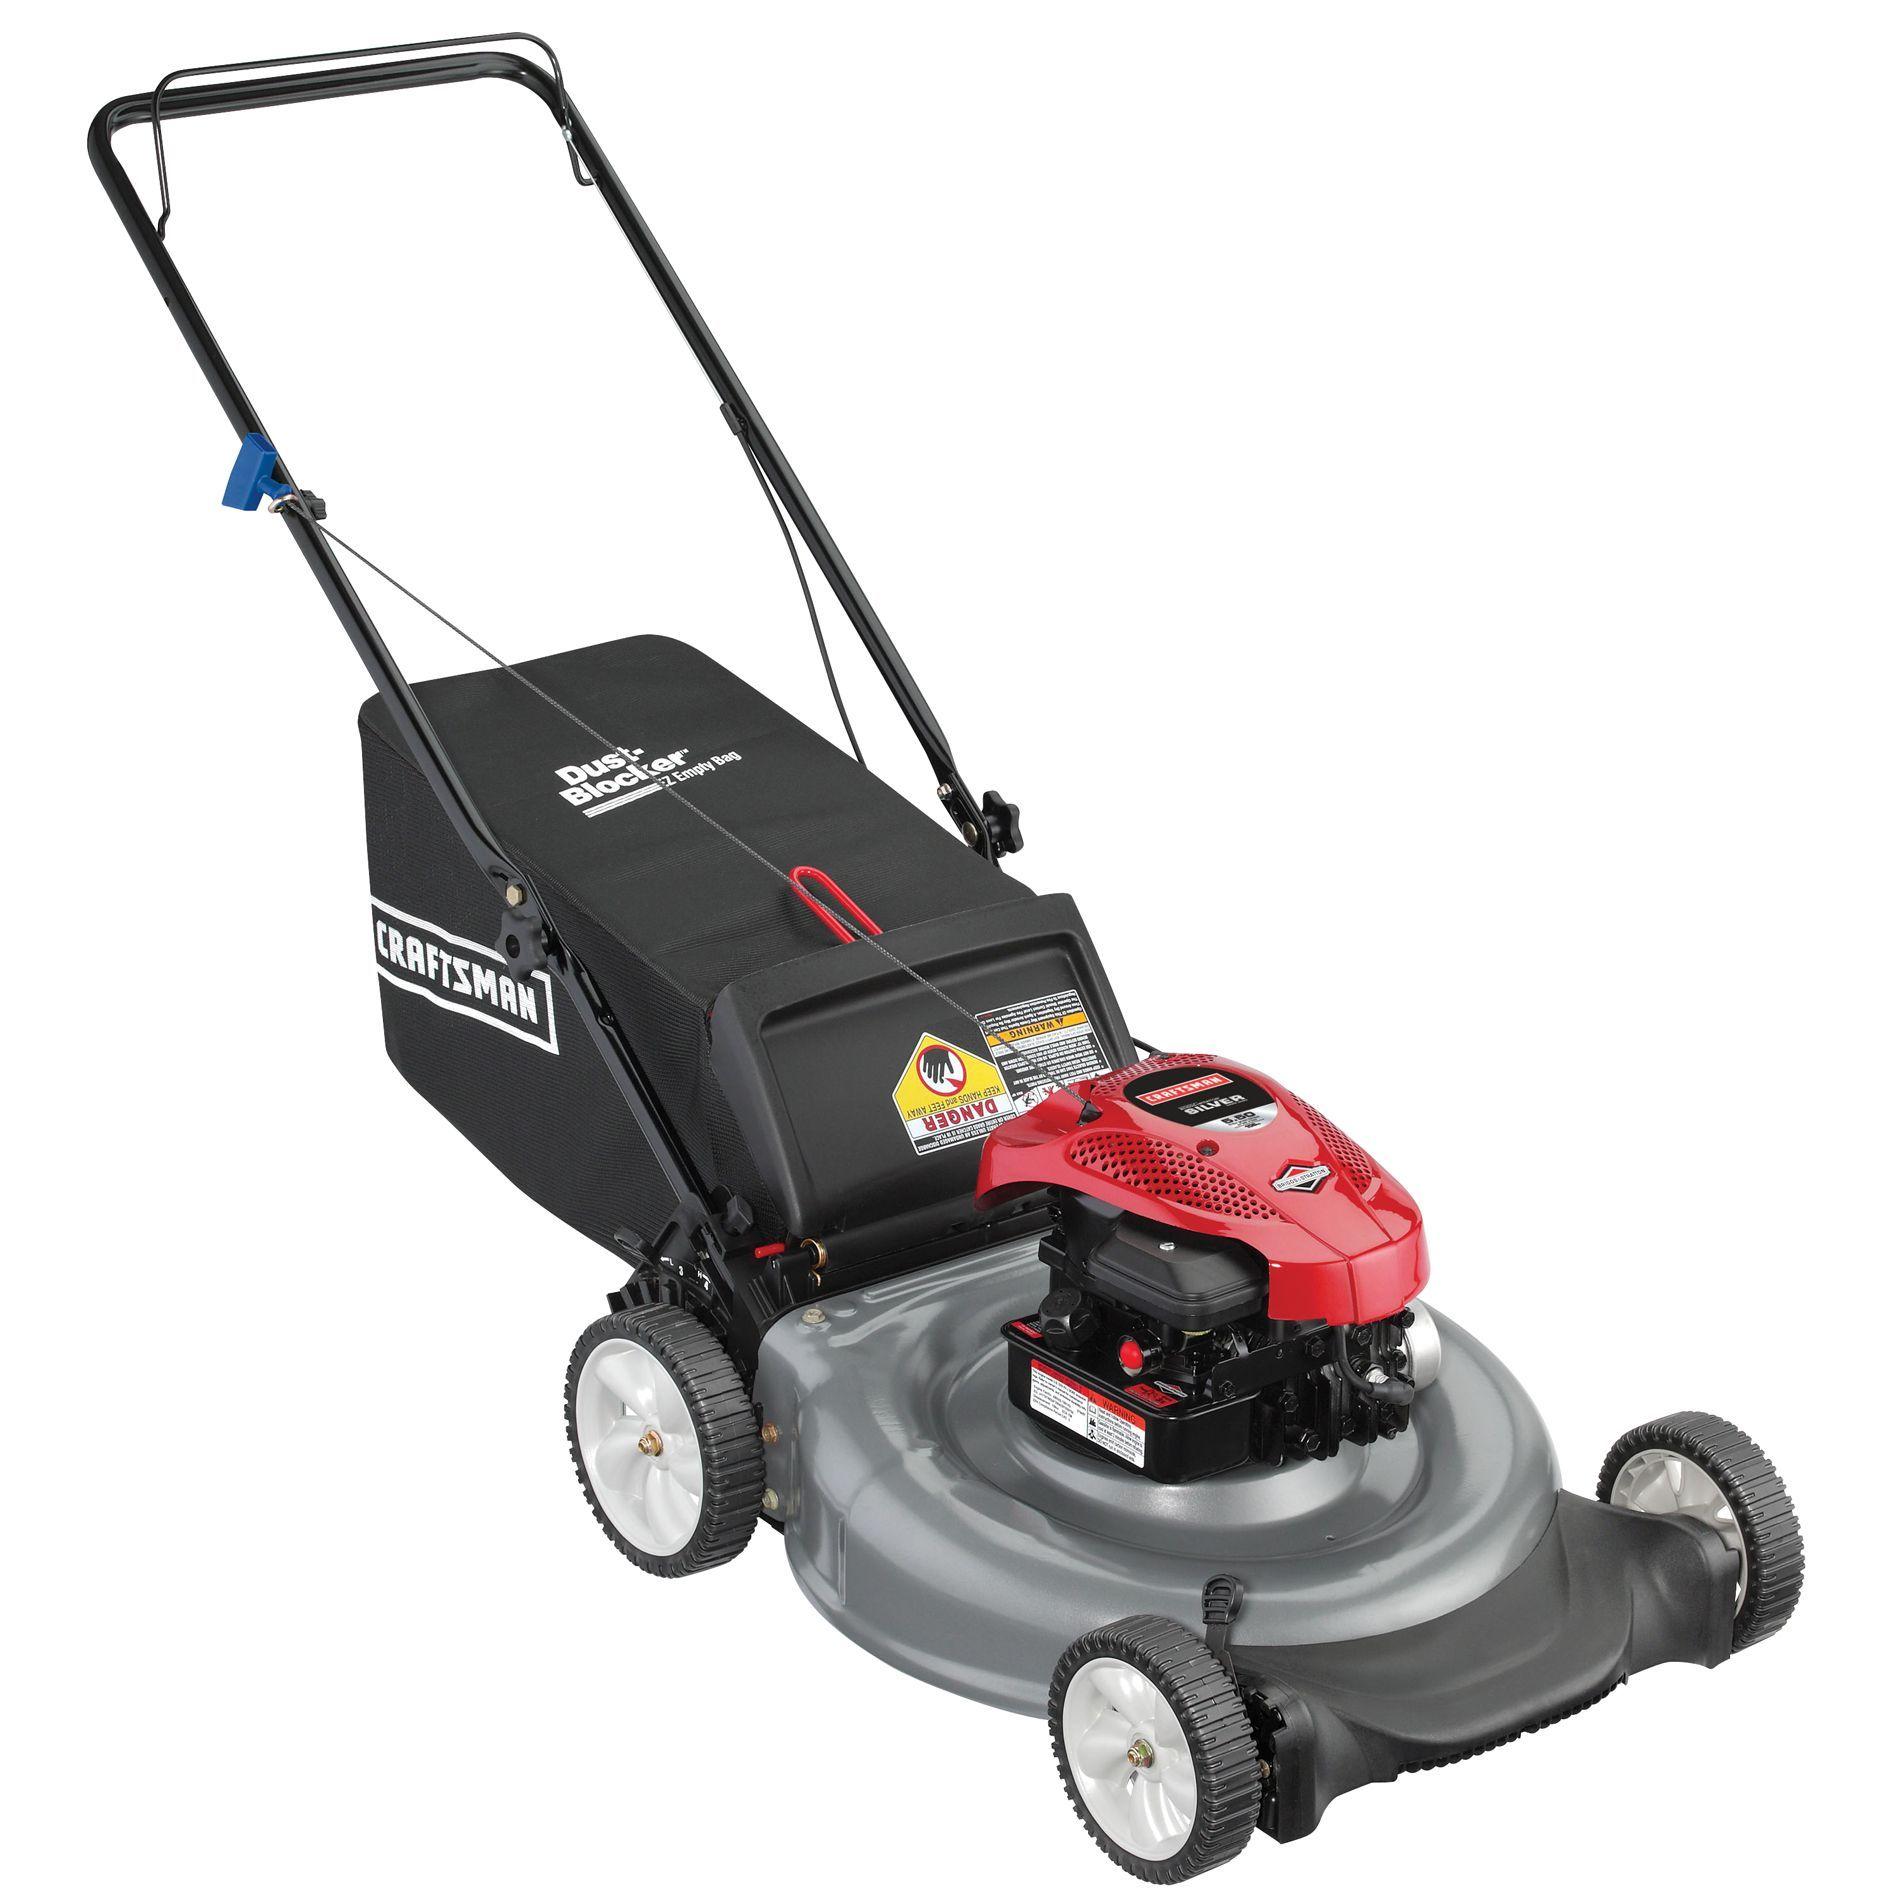 Craftsman 11a A15a099 Lawn Mower 21 158cc Rear Bag Push Lawn With Smooth Start Non Ca Gray Push Mower Briggs Stratton